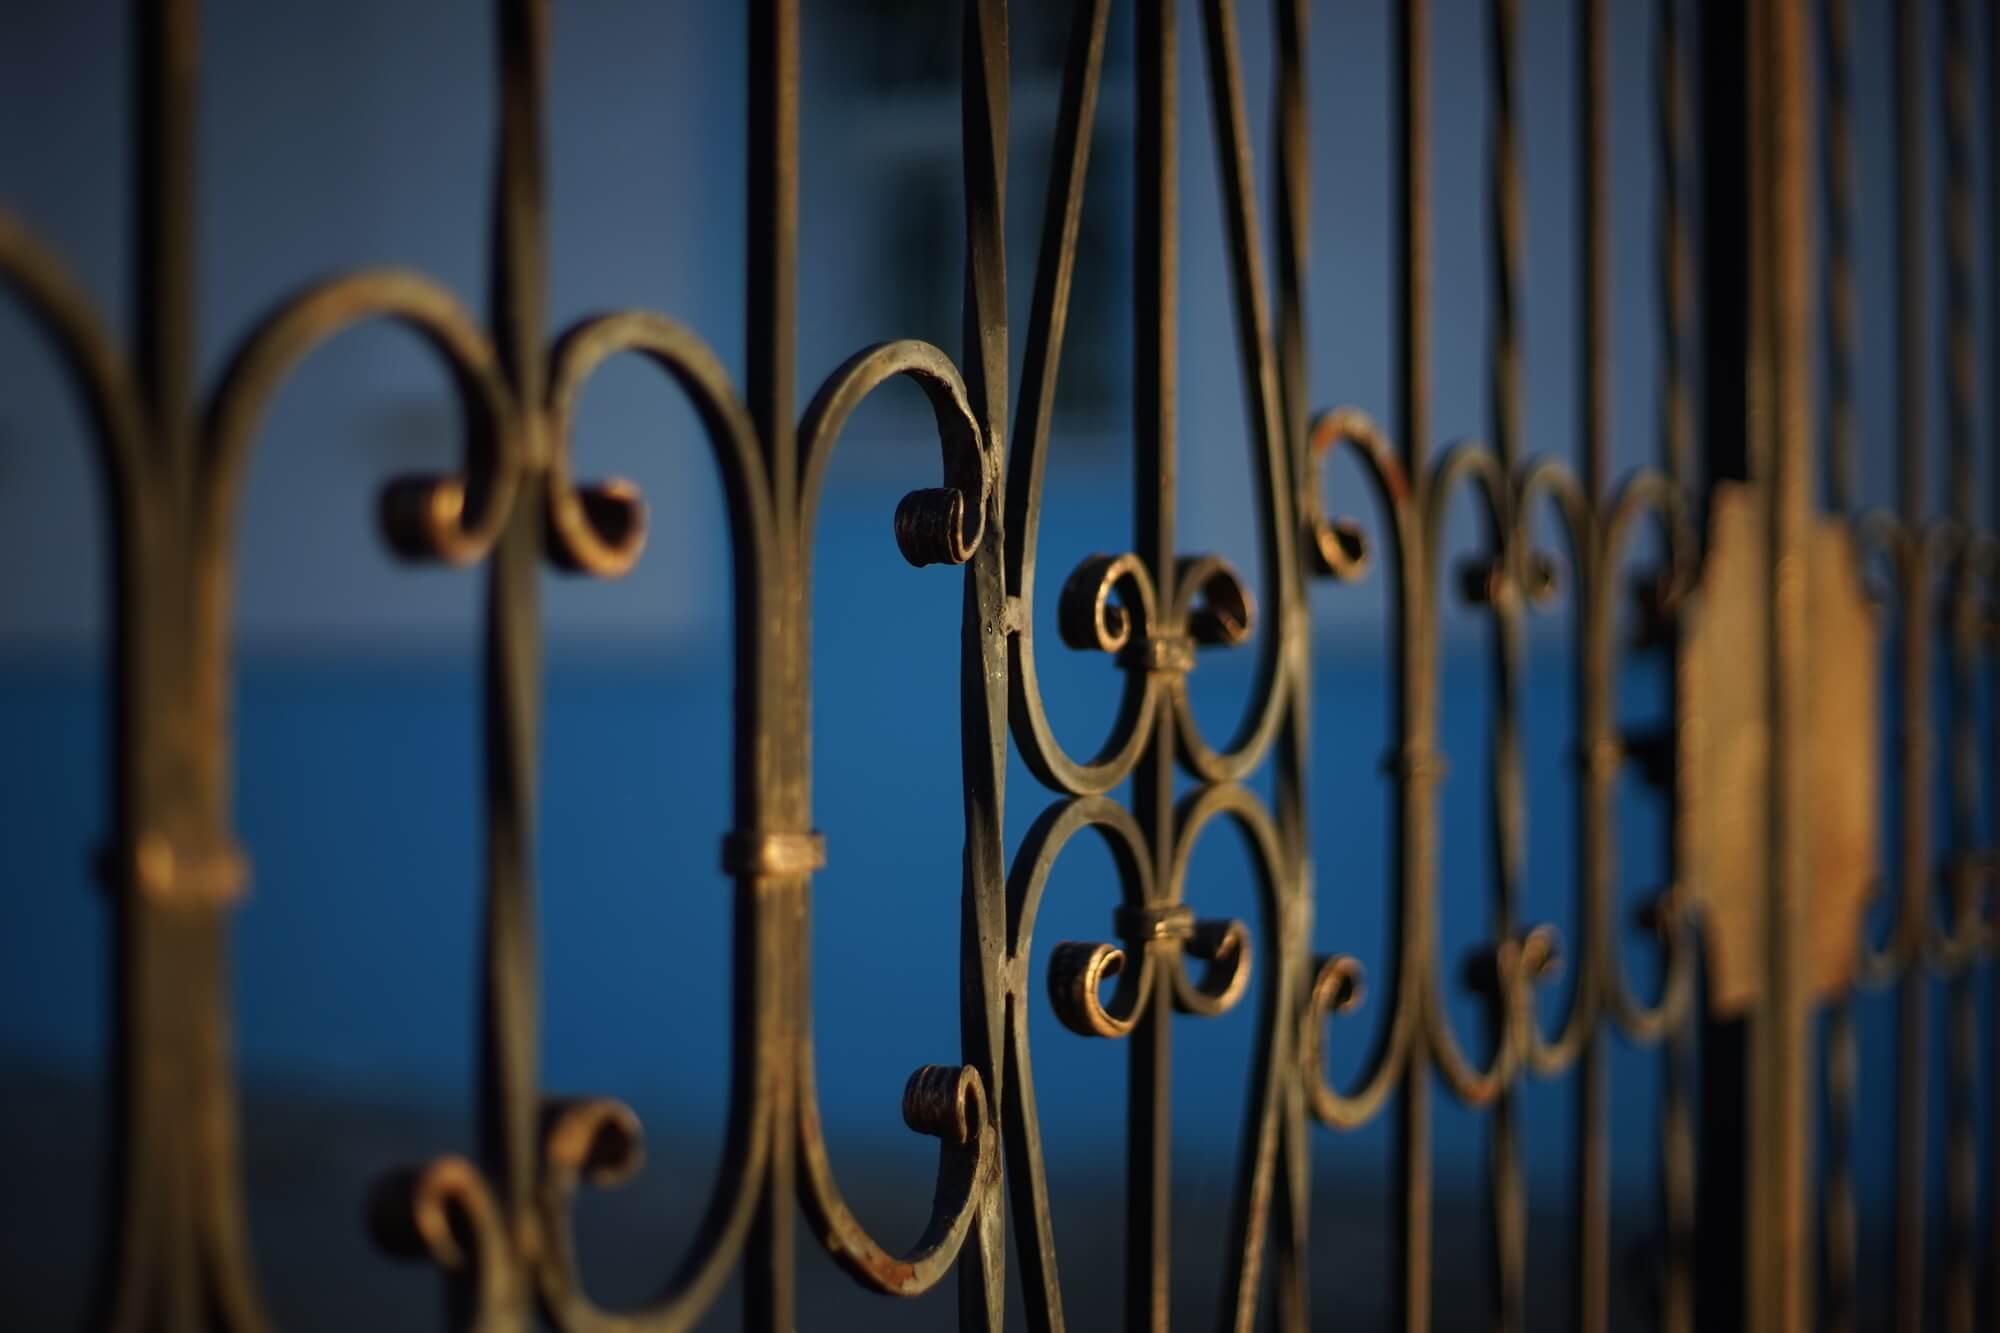 Black Forged Metal Fences - Big Easy Fences